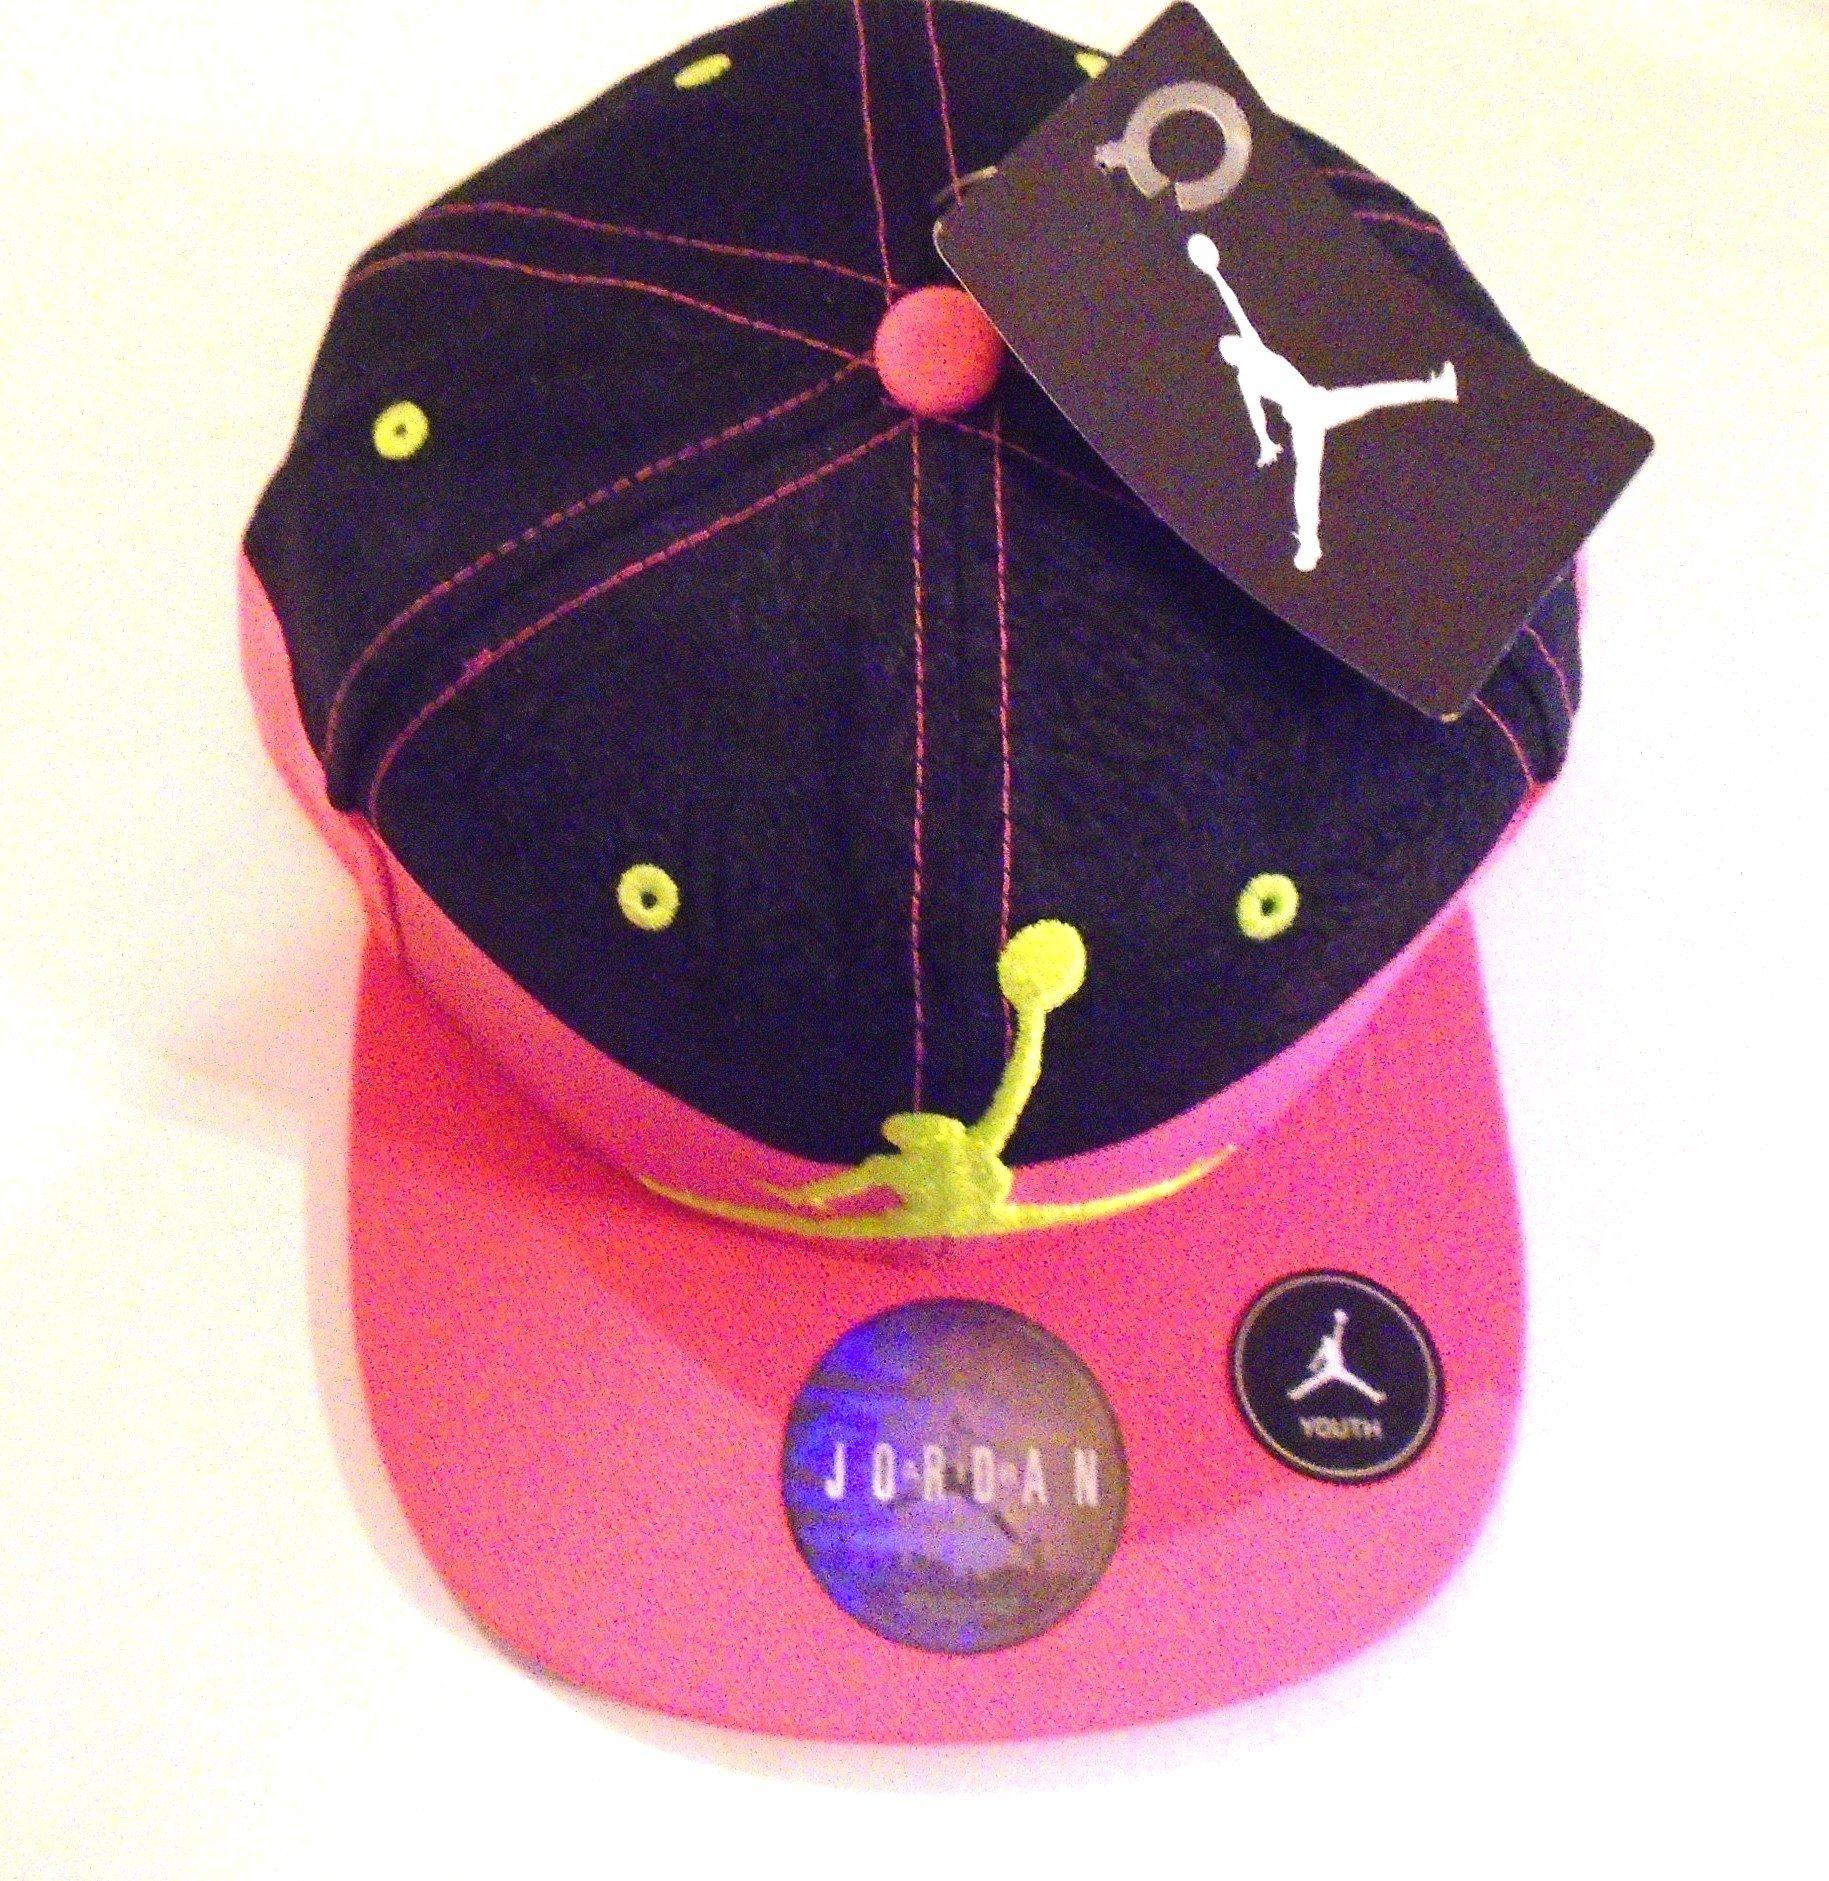 9dc87fe5ca8 Galleon - NIKE Jordan Fly Two-Tone Print Court Cap Retro Pro Hat  (Black Dynamic Pink Power Rush Volt Logo) Youth 8-20